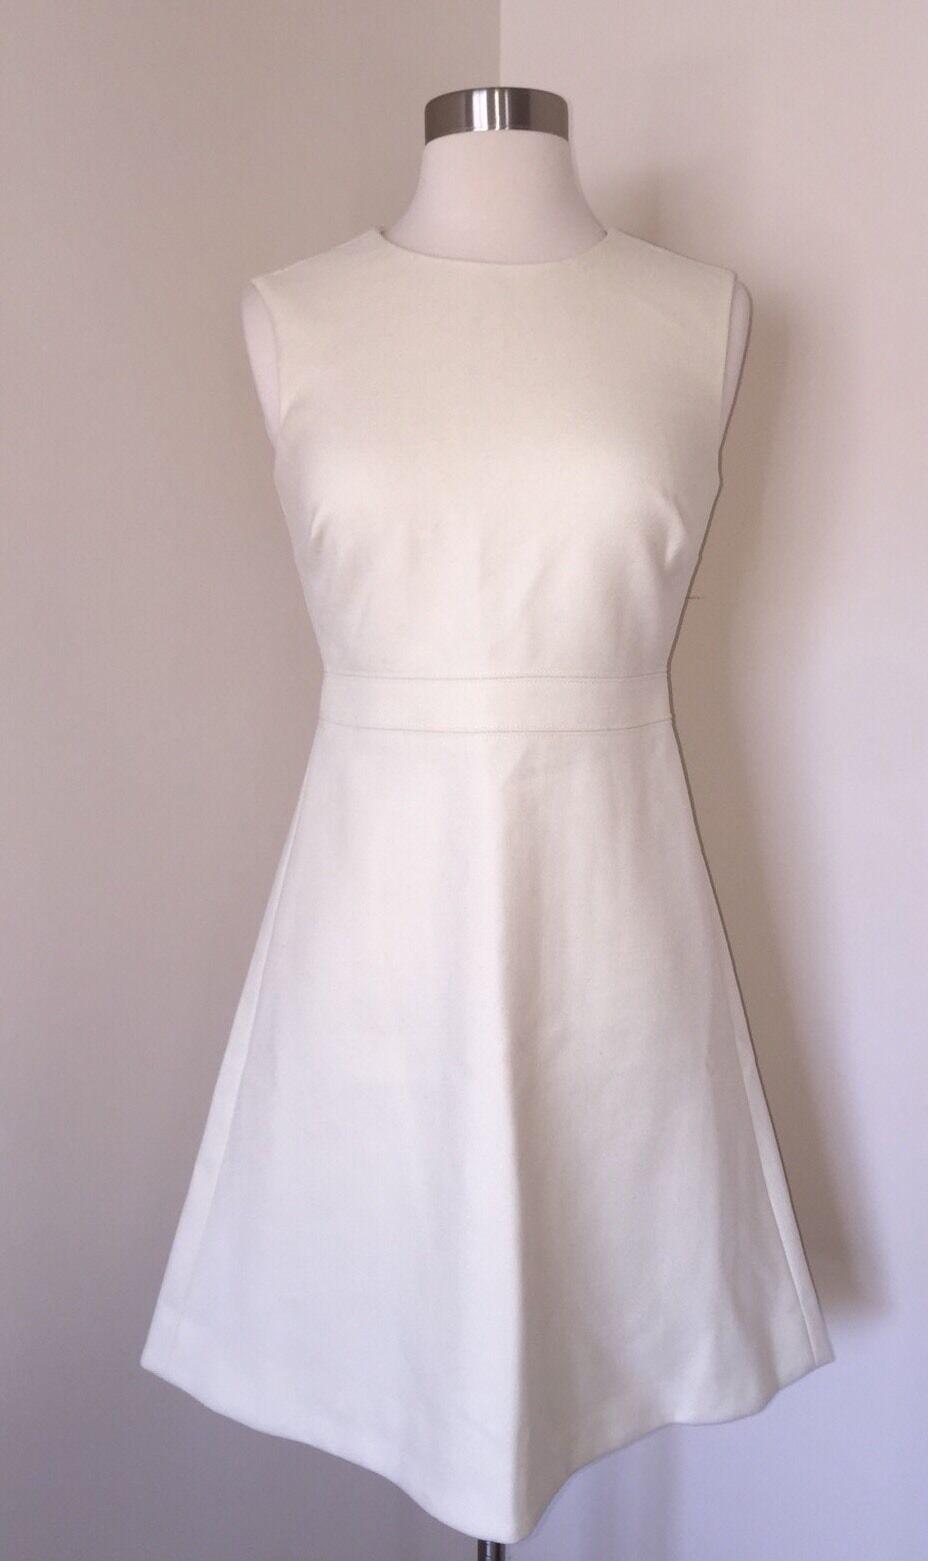 J.CREW  A-LINE DOUBLE SERGE WOOL SHEATH DRESS 0P IVORY G0527 NEW